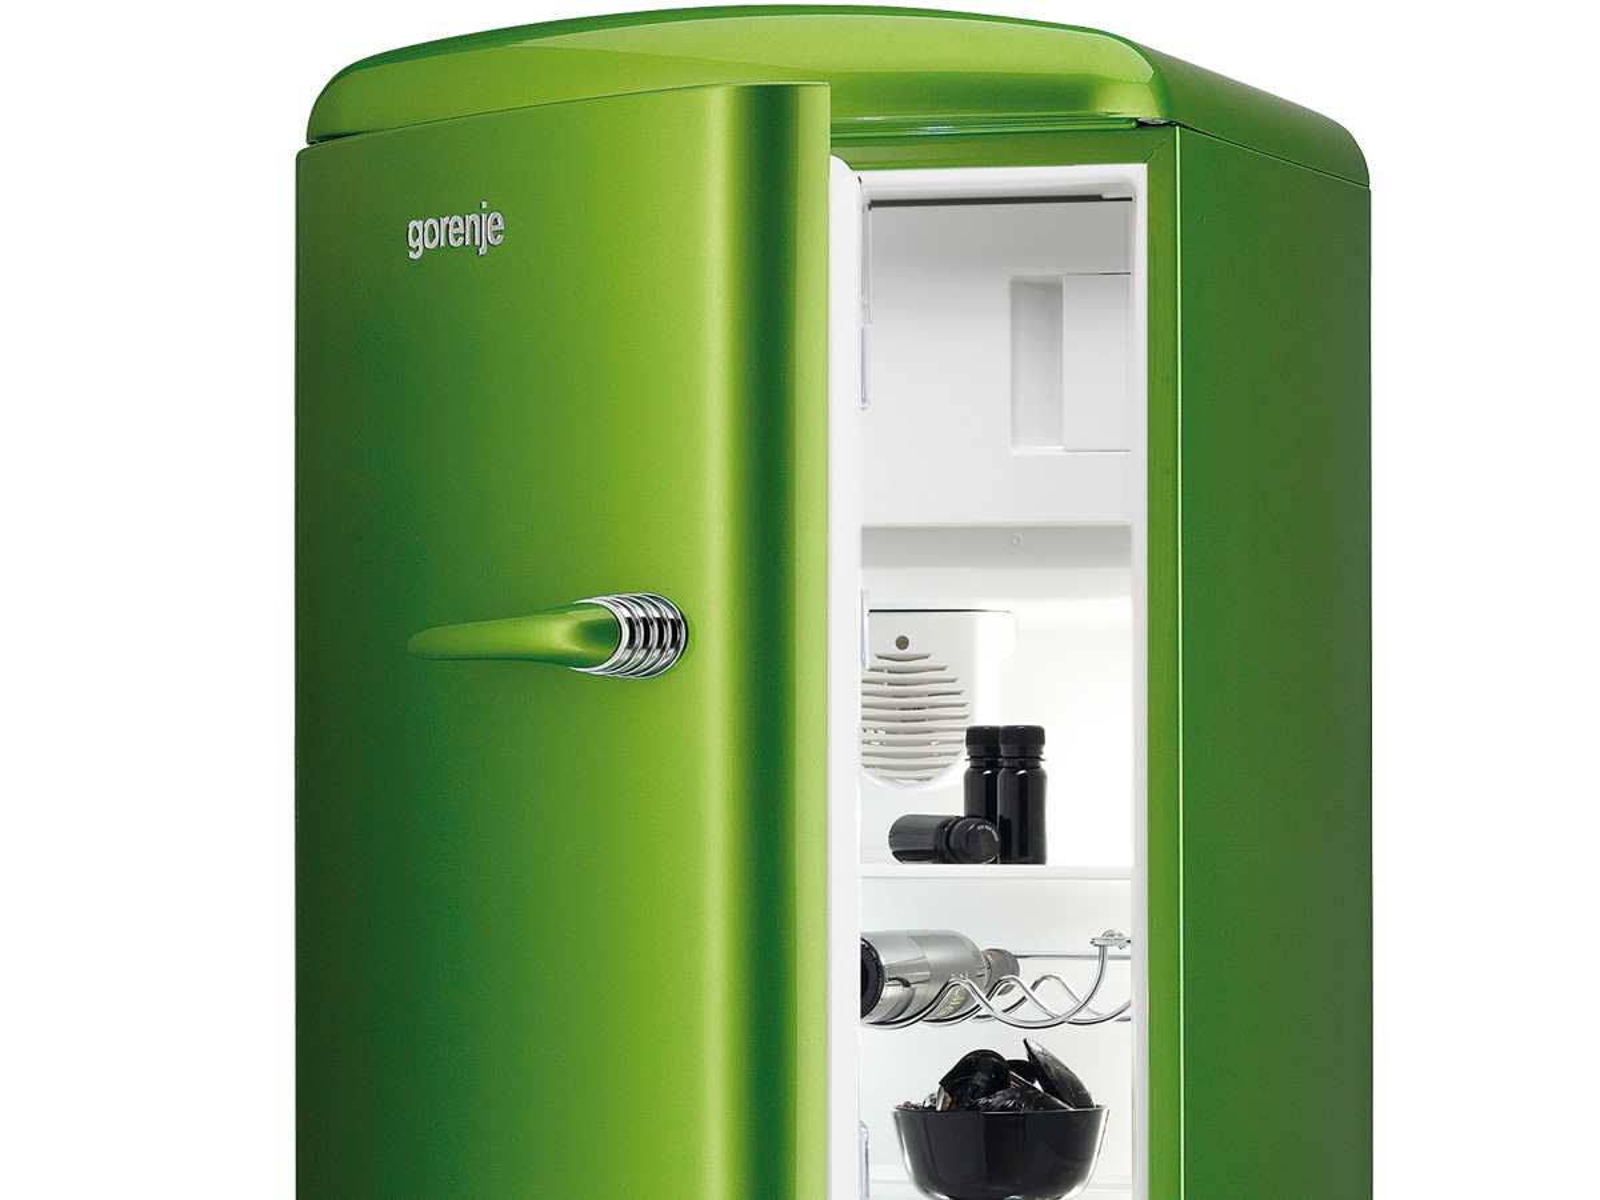 Gorenje Kühlschrank Service : Smeg grun retro kühlschrank thomas s chichester